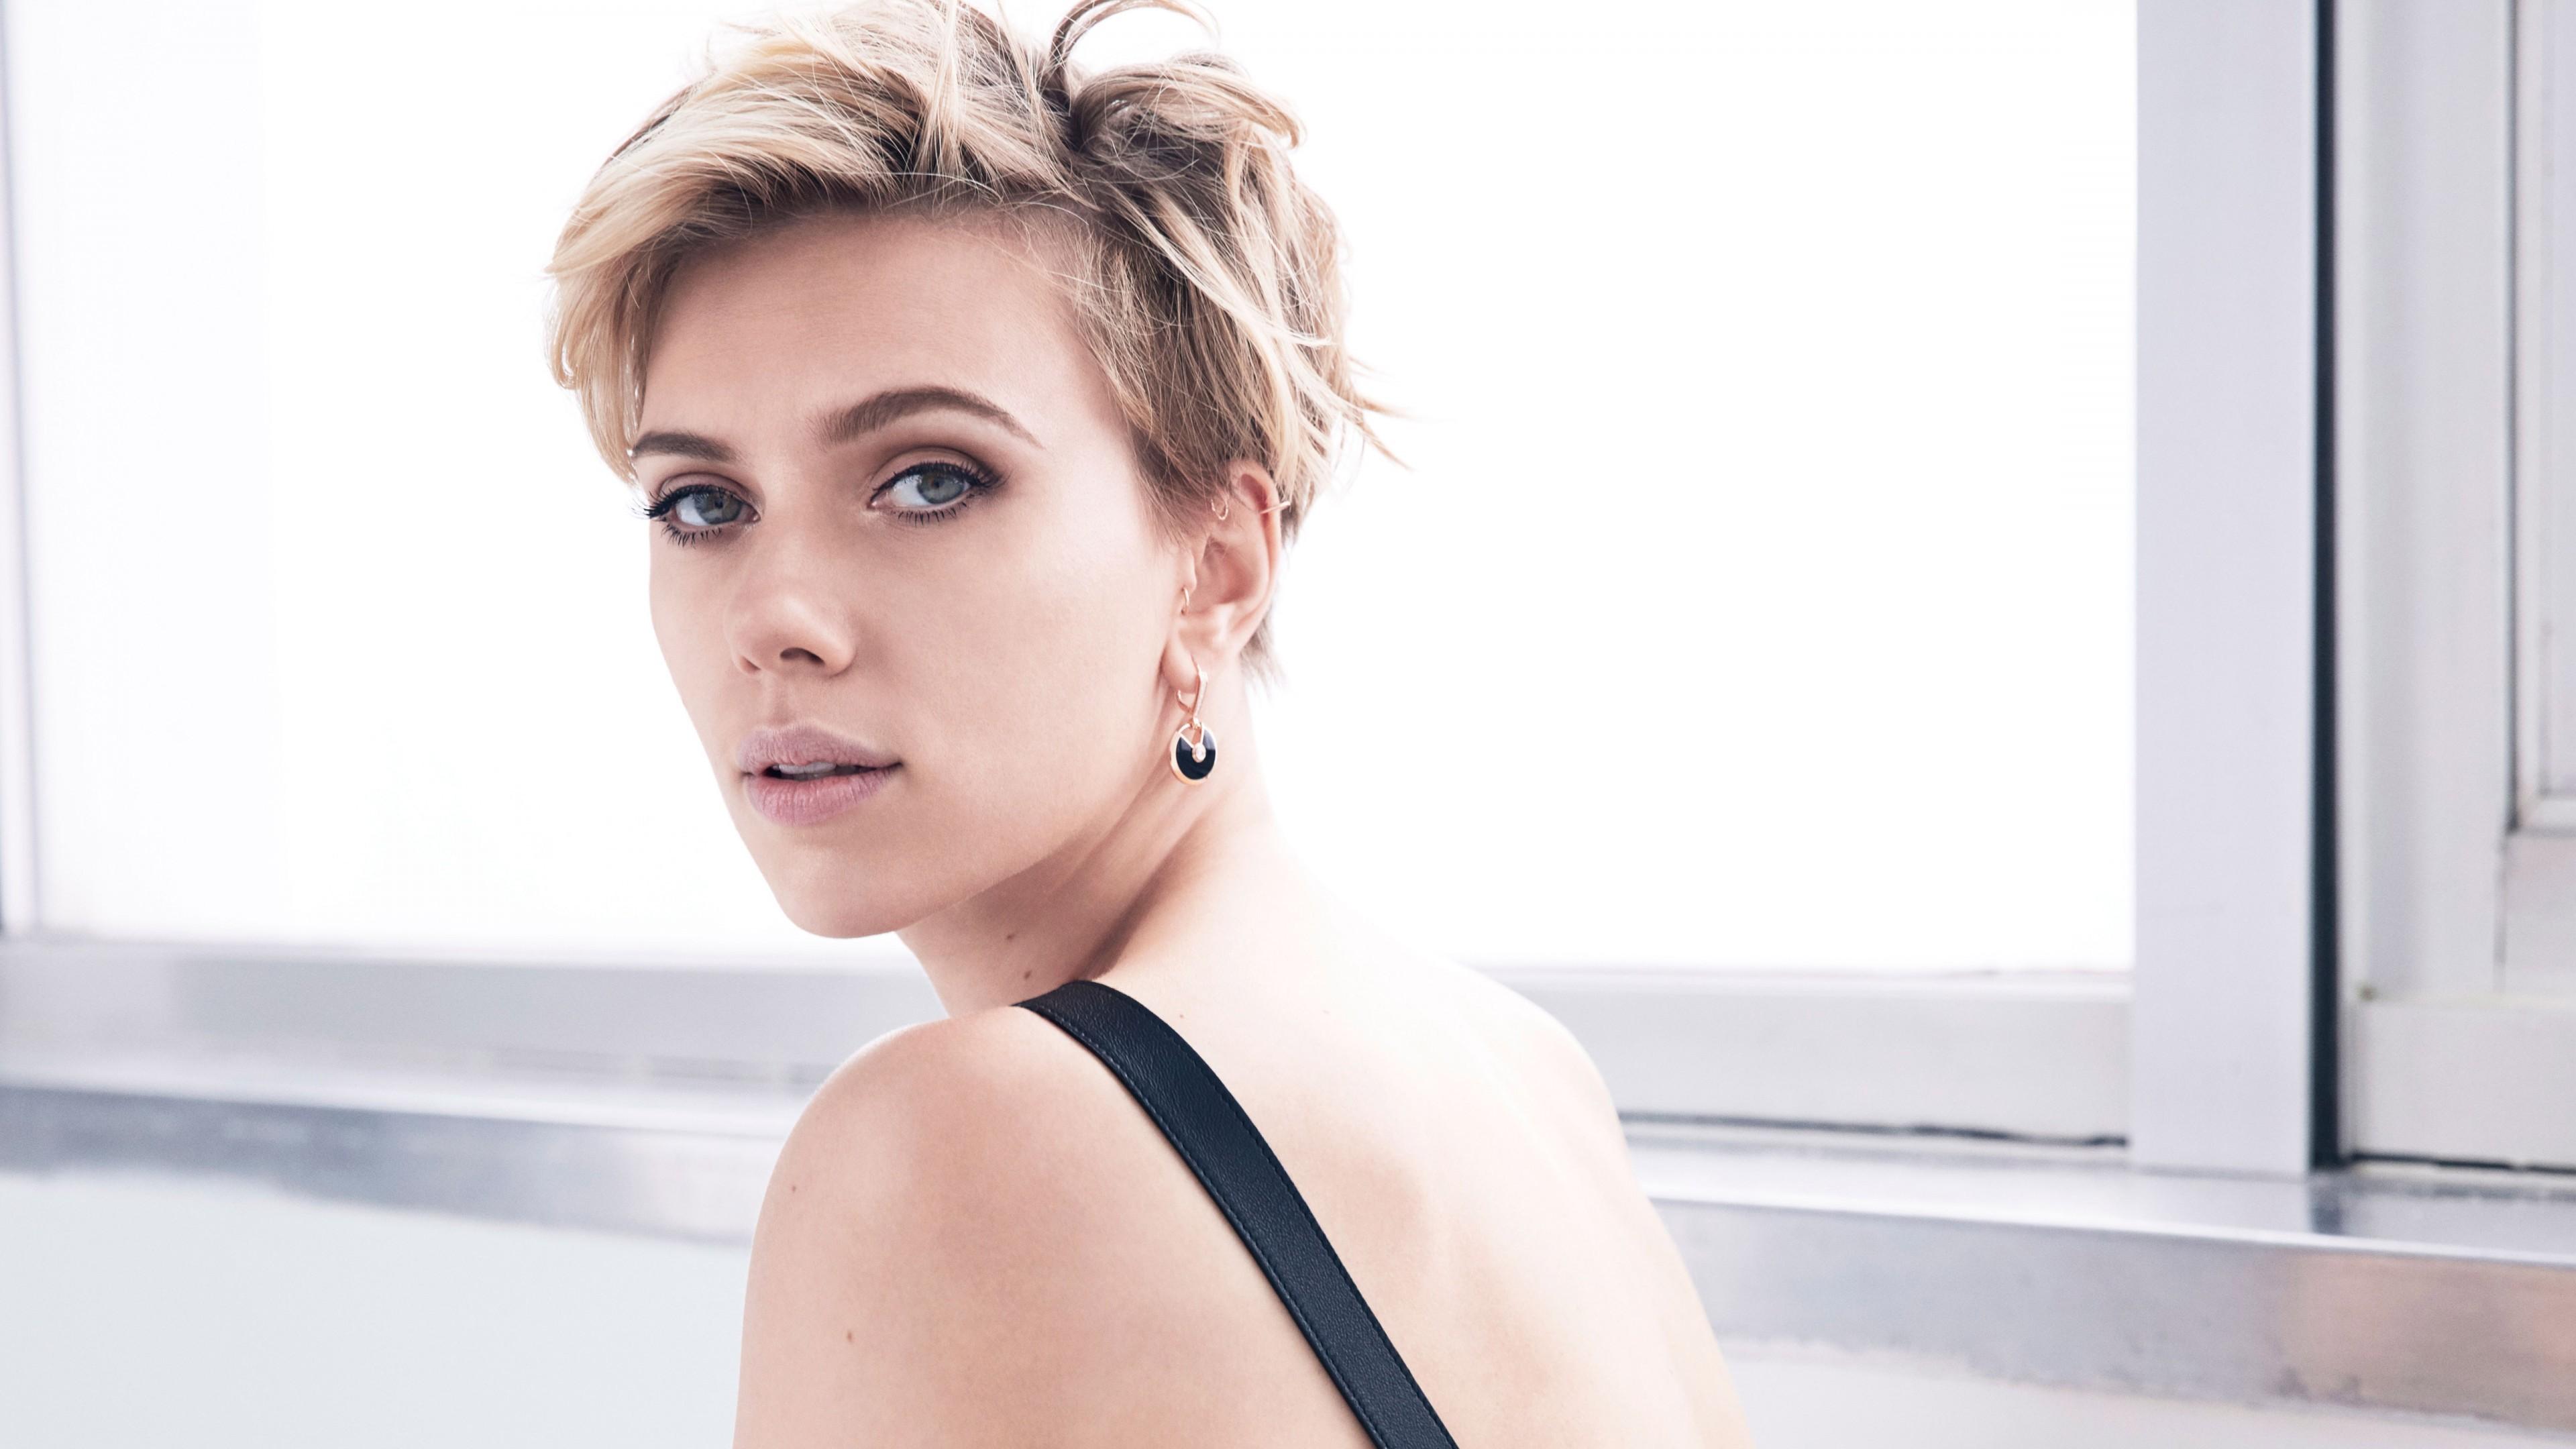 Scarlett johansson wallpaper hd 2018